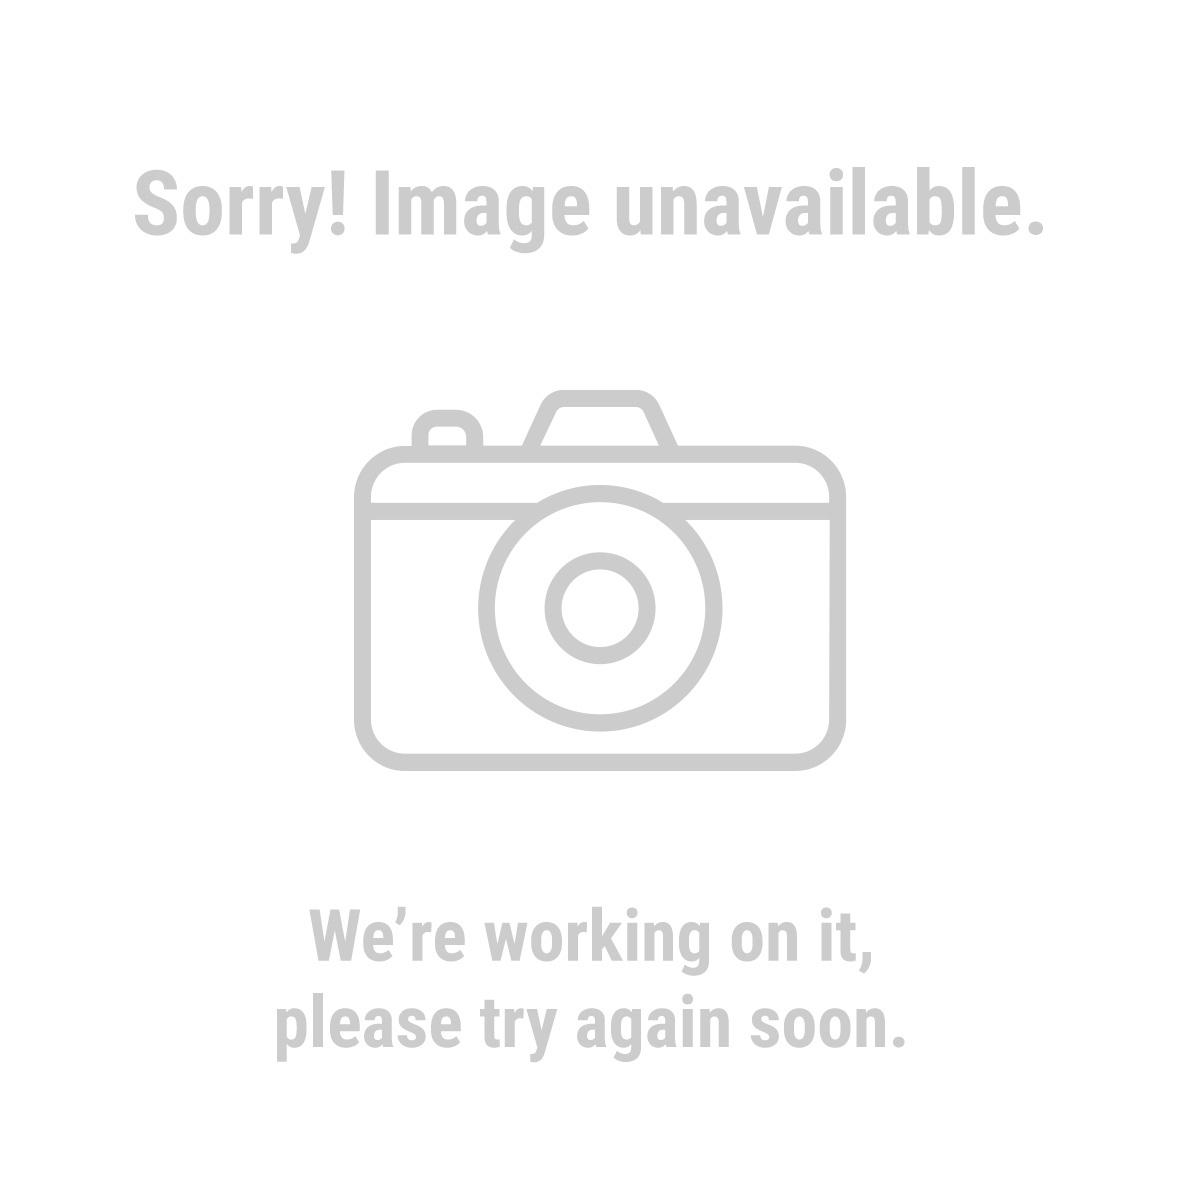 Predator Generators 63089 4000 Peak/3200 Running Watts, 6.5 HP  (212cc) Generator CARB